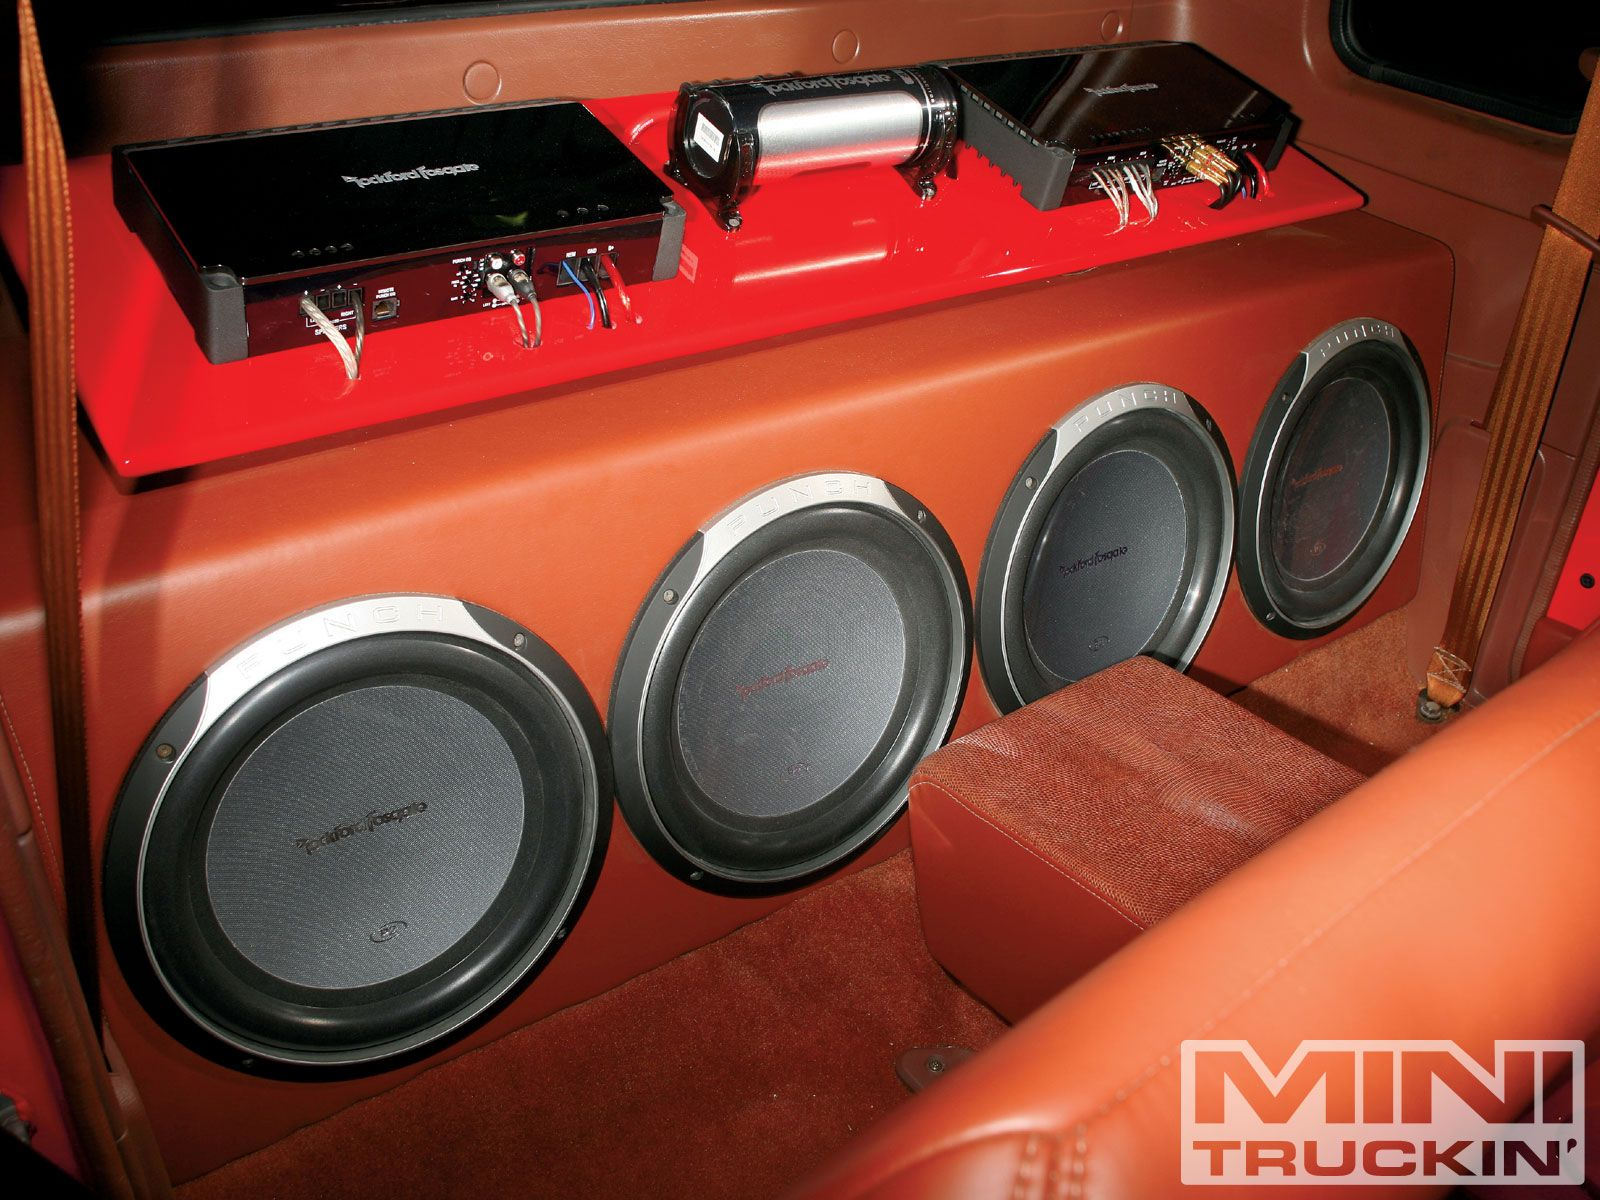 Cool Speaker Boxes 1992 mazda b2200 subwoofers   mazda b2200   pinterest   mazda, car